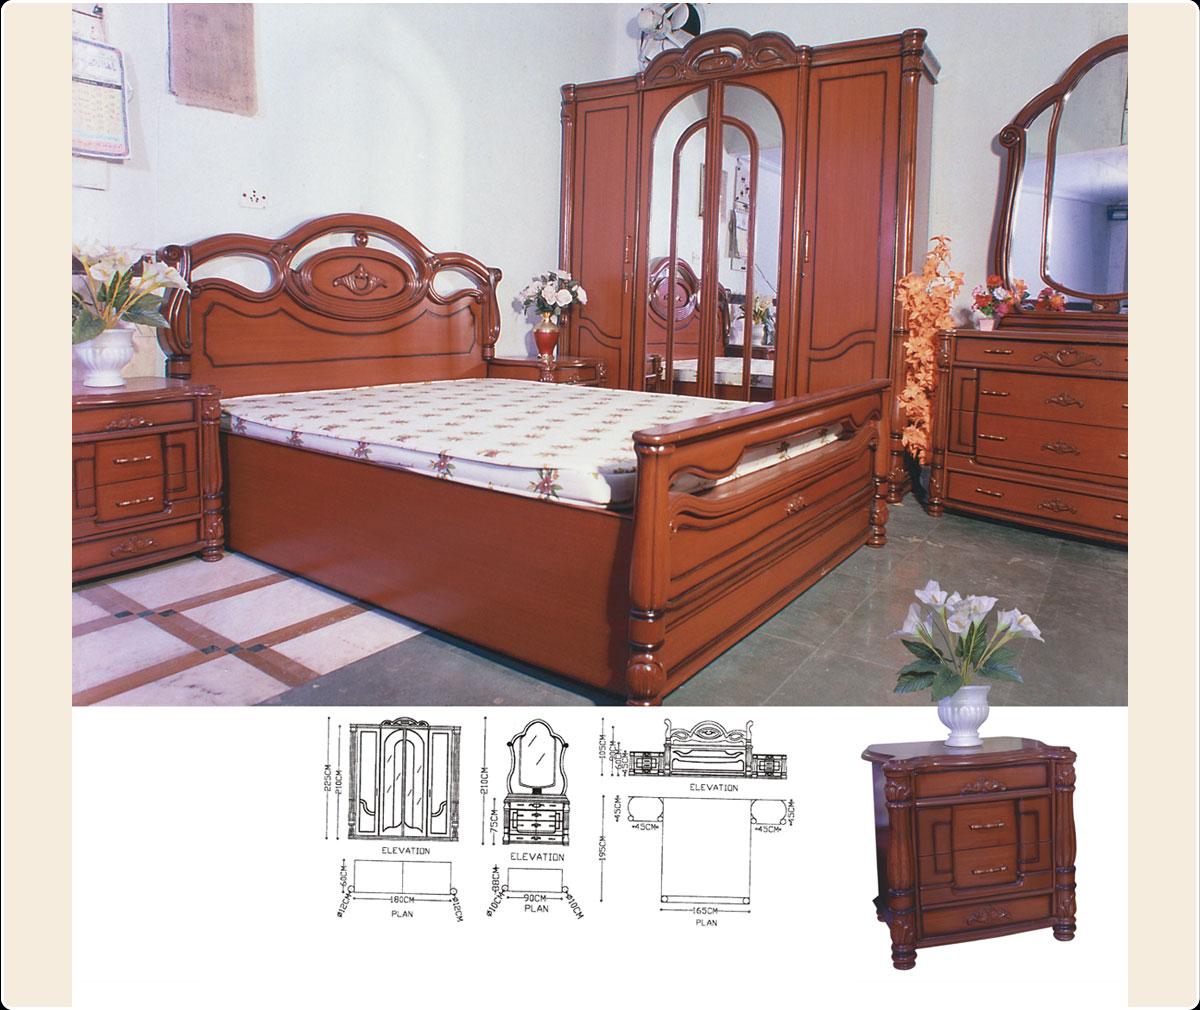 Fevicol Furniture Book Sofa Designs Klaussner Options Sectional Sudarsan Plylam